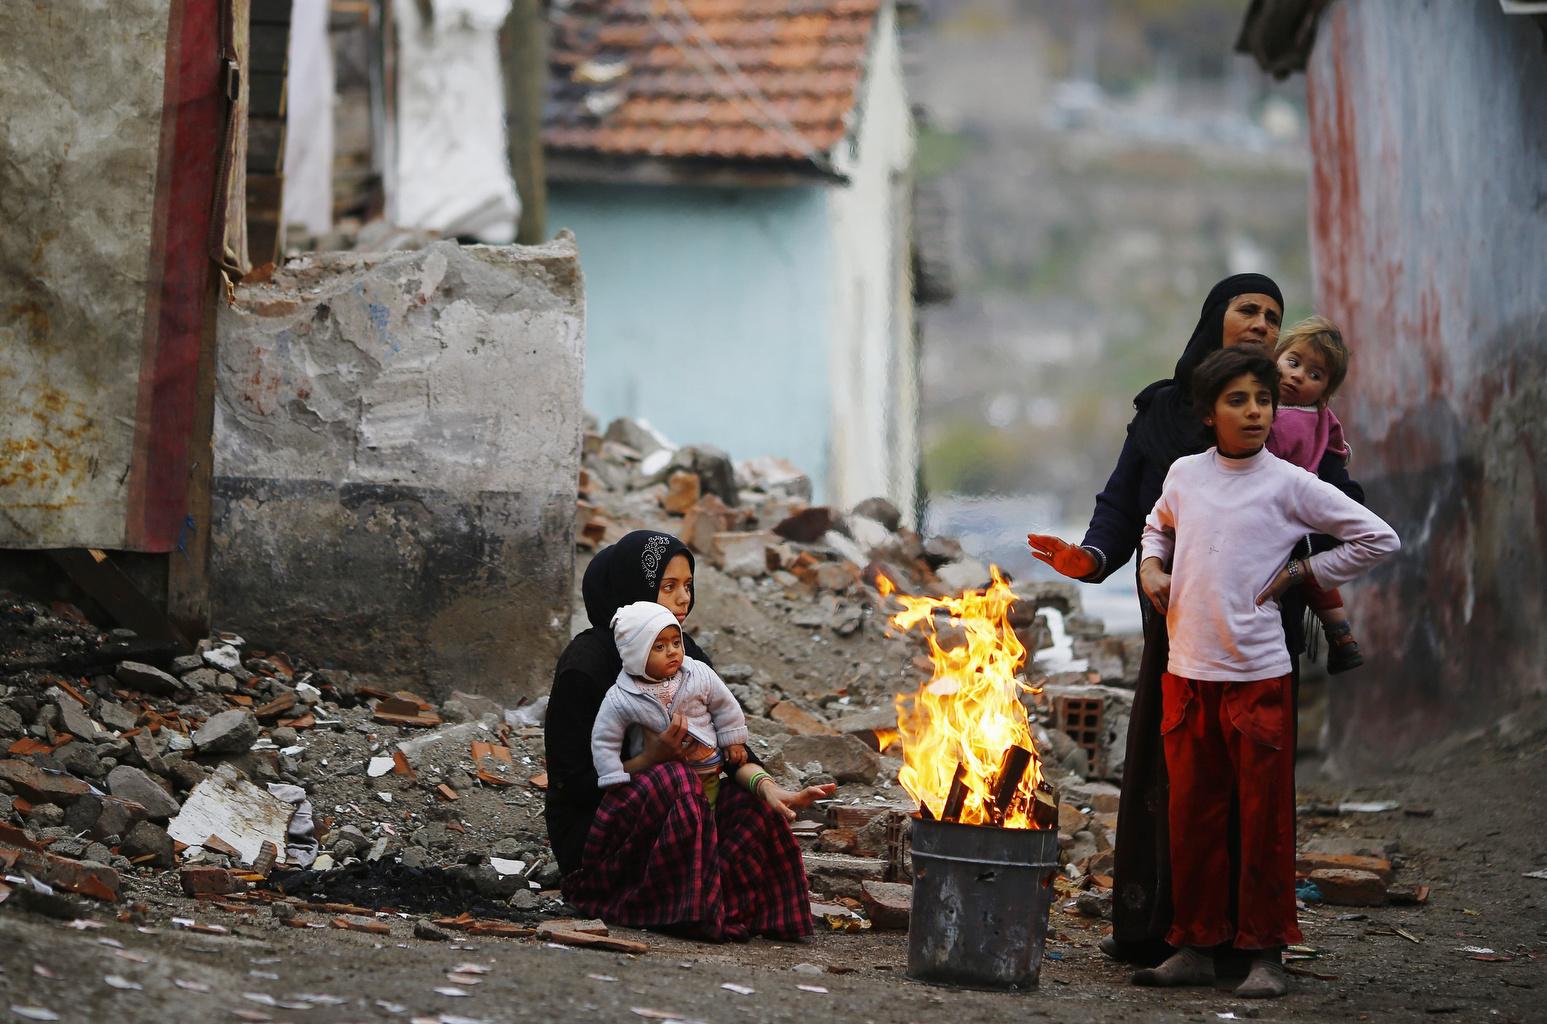 Syrian refugees warm themselves around fire in Turkey